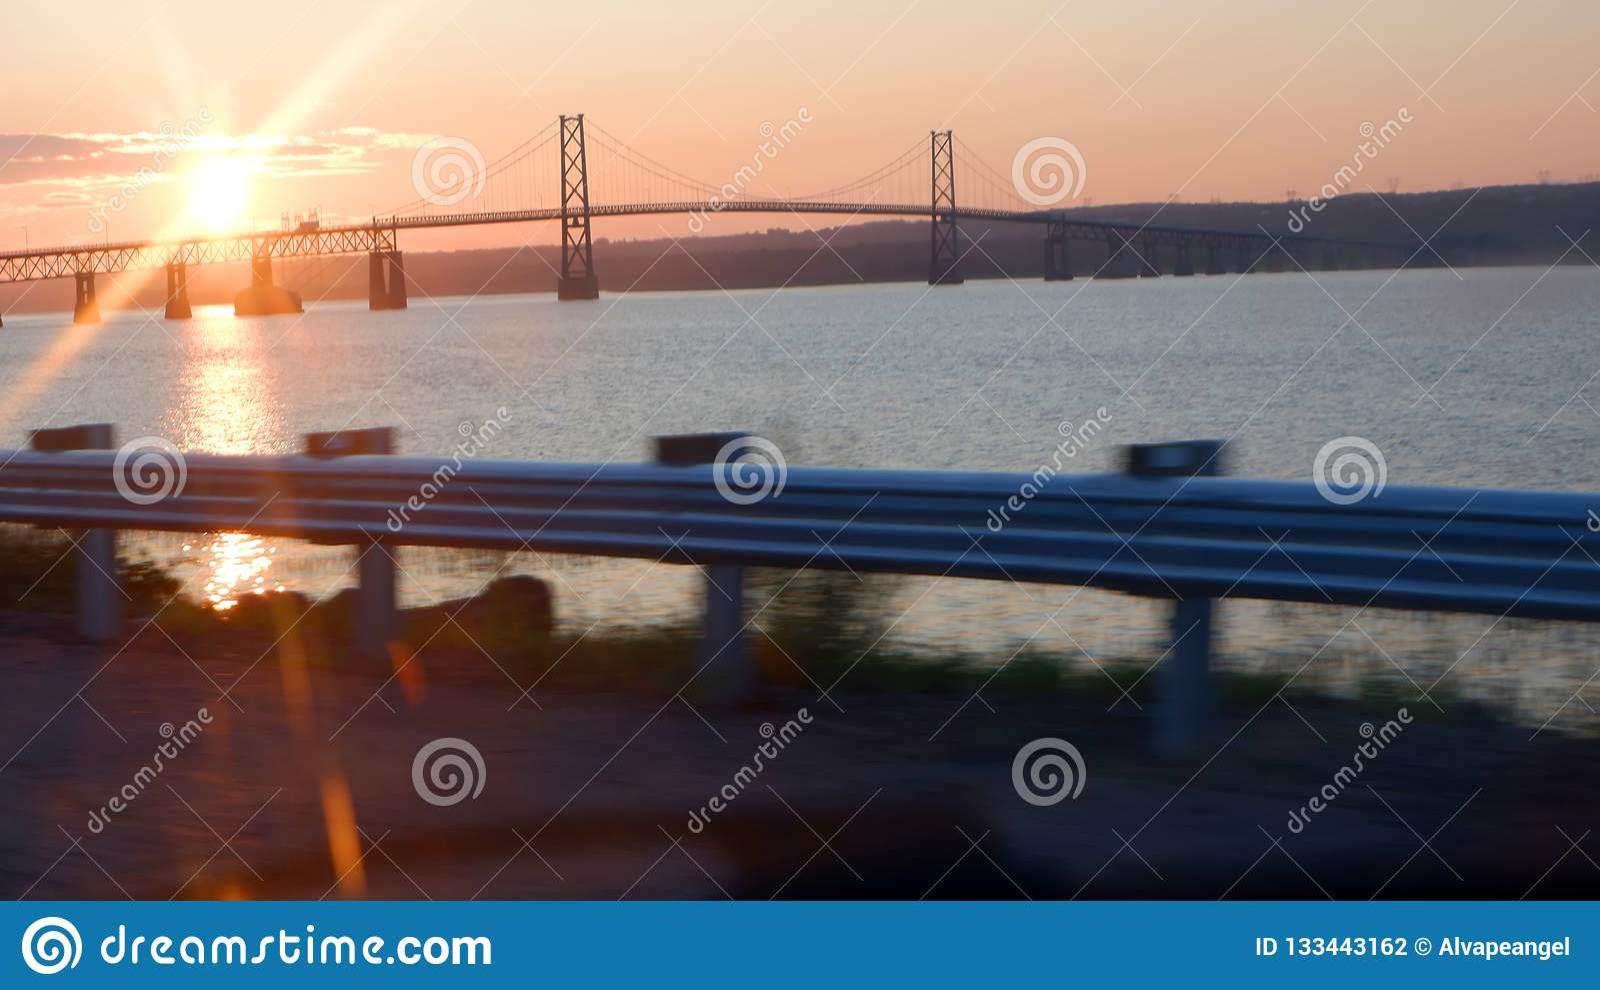 Sunrise on a bridge